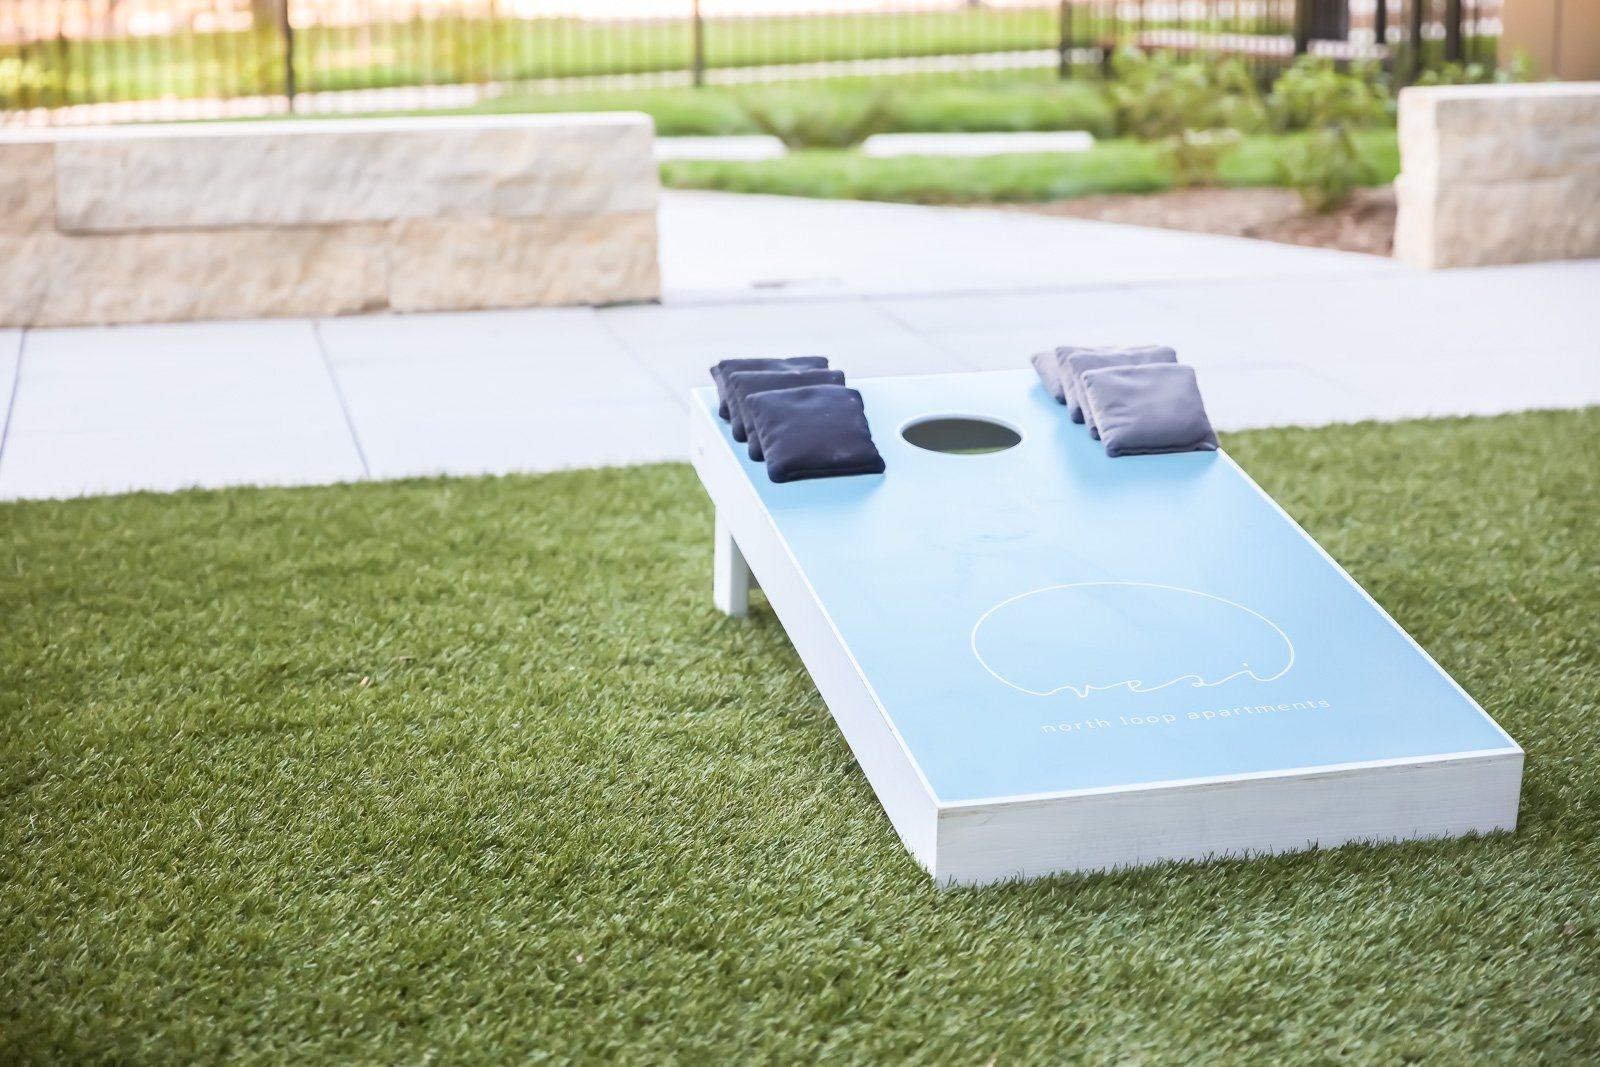 Cornhole or Bean Bag toss on artificial turf